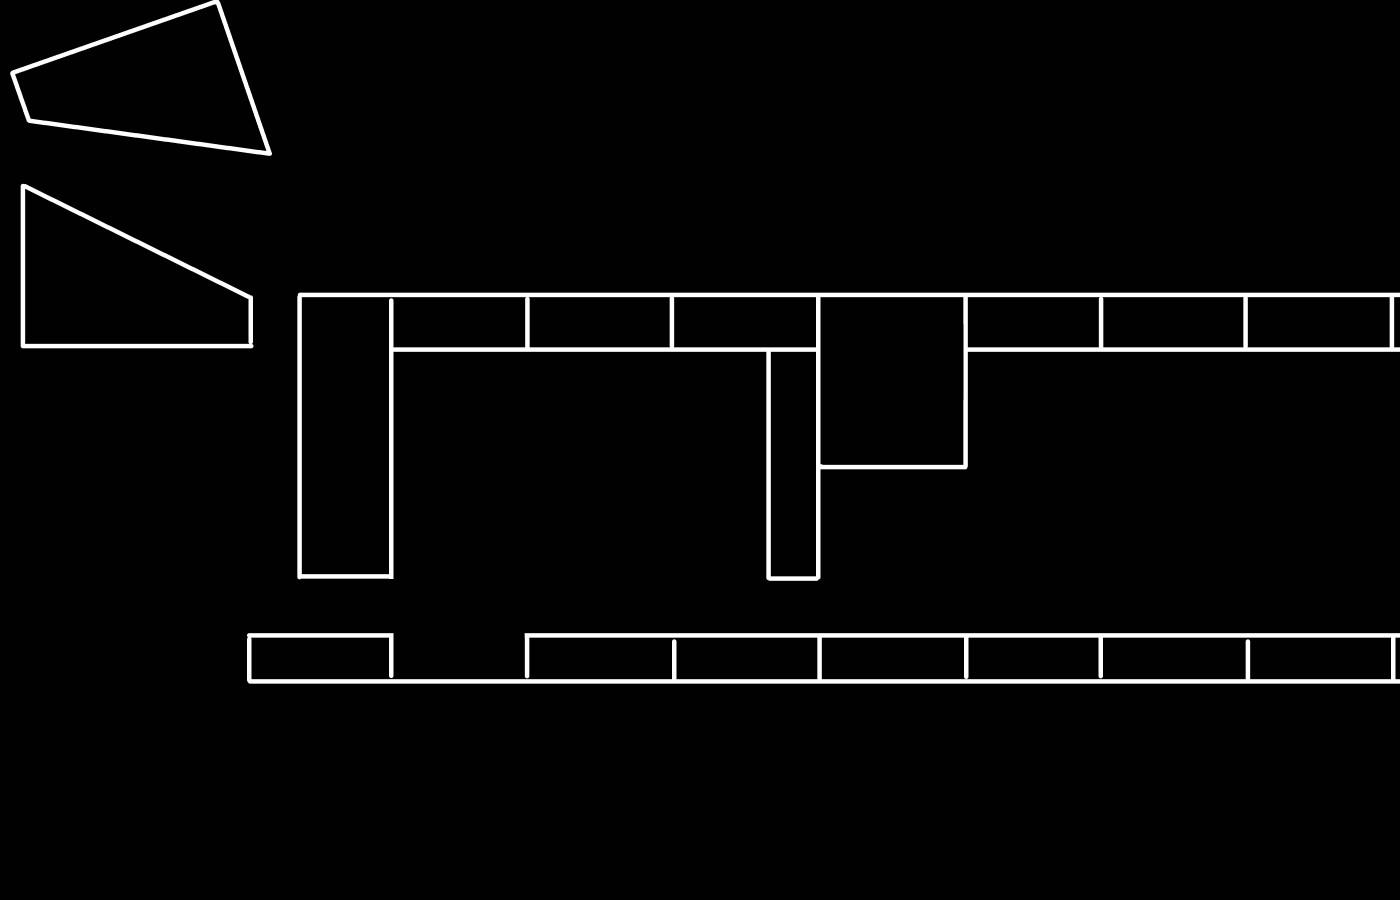 AnSwinnen_Architect_DDC_1.jpg